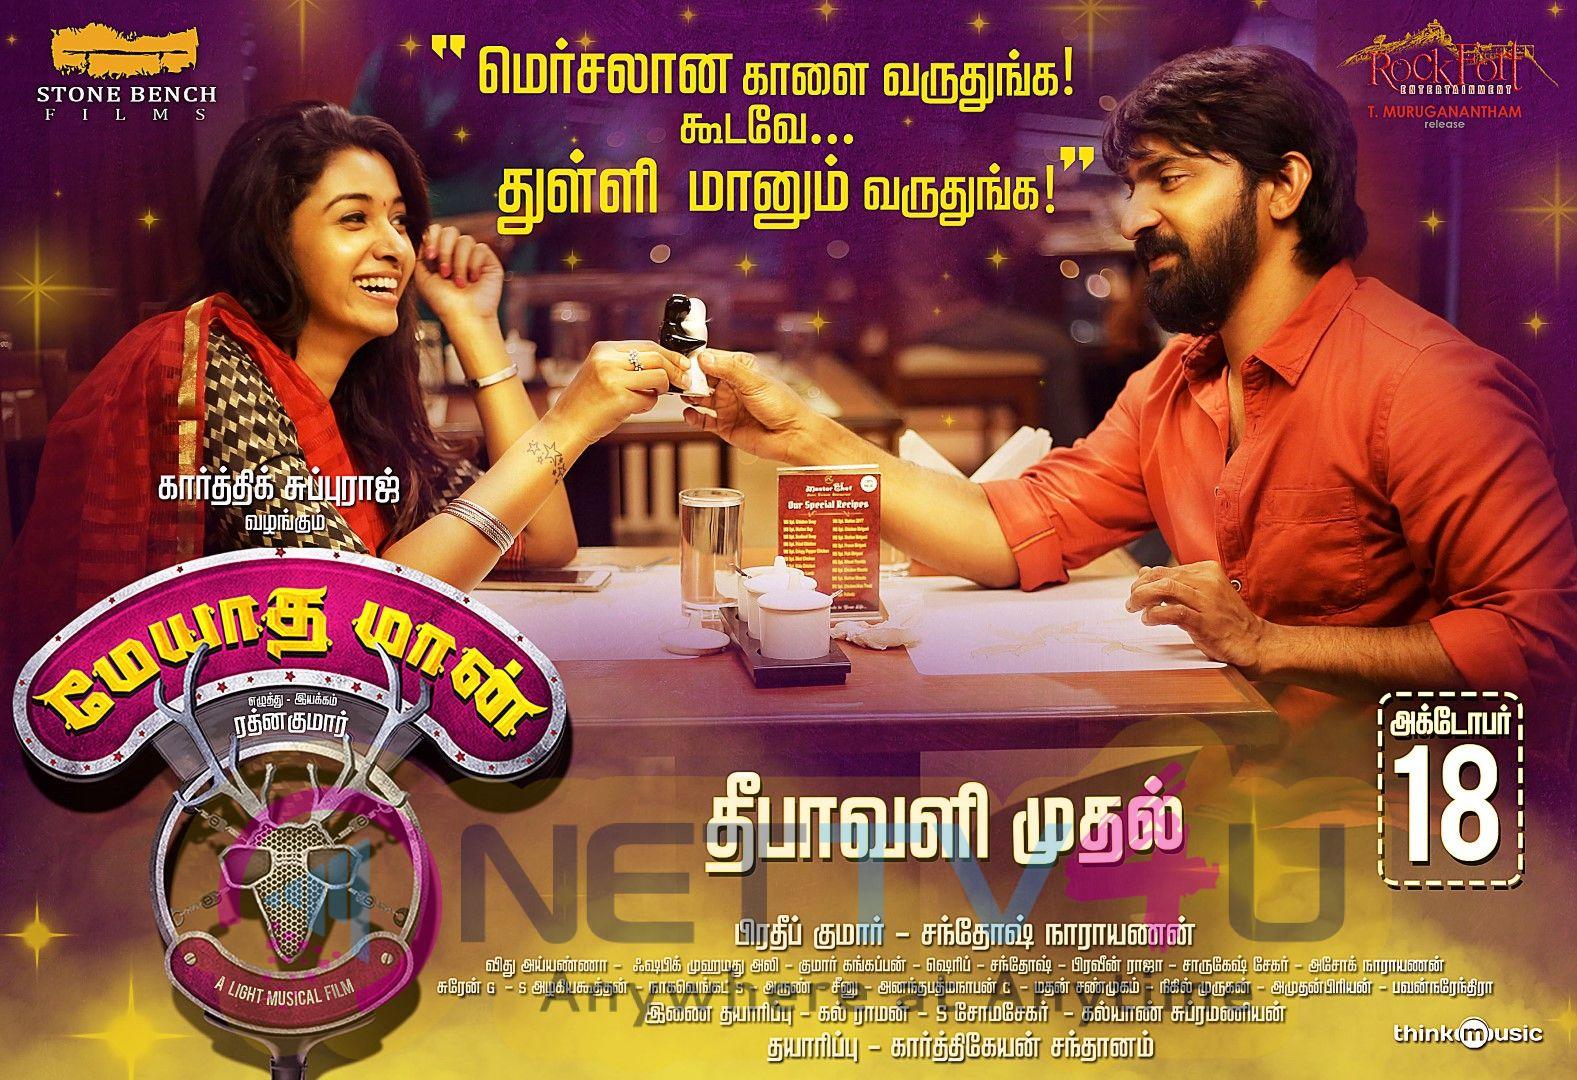 Meyaadha Maan Movie Diwali Release Poster